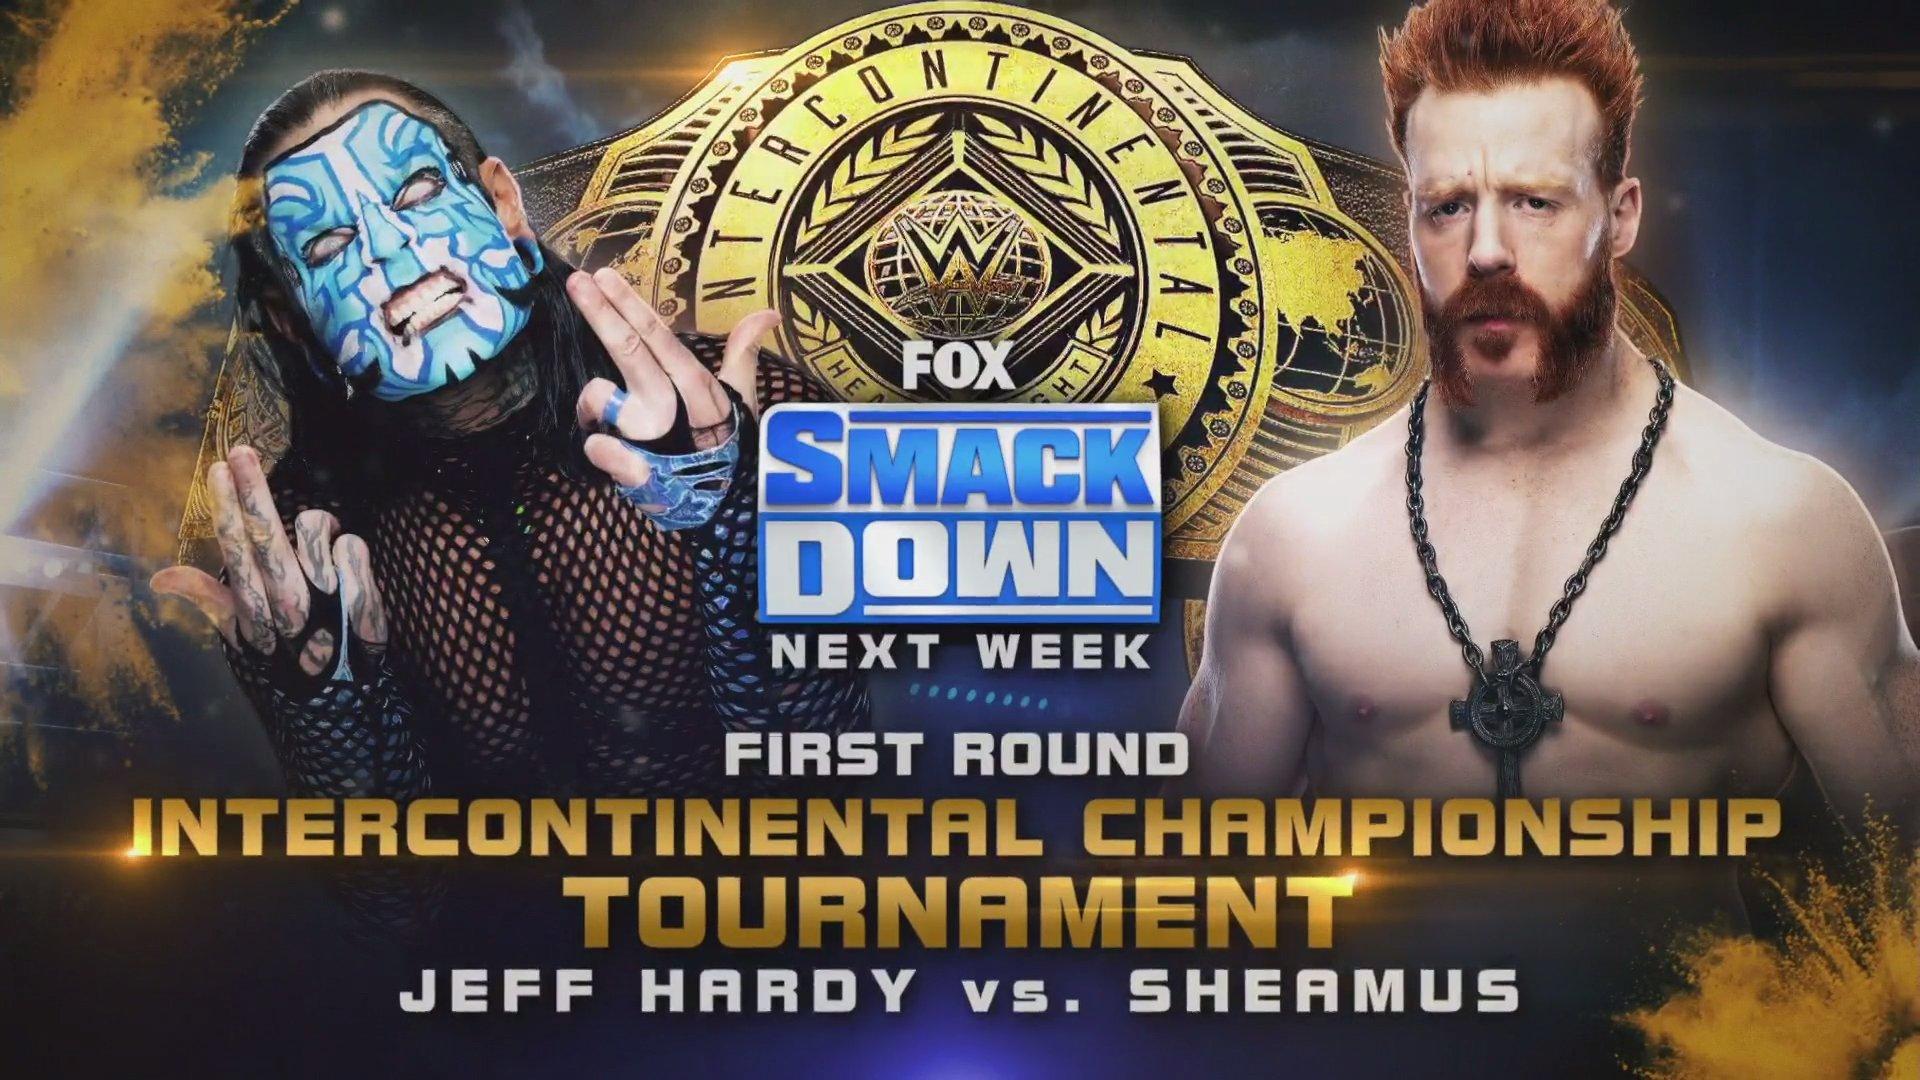 WWE Smackdown Preview (22/05/20): Champion vs Champion; IC Title Tournament 3